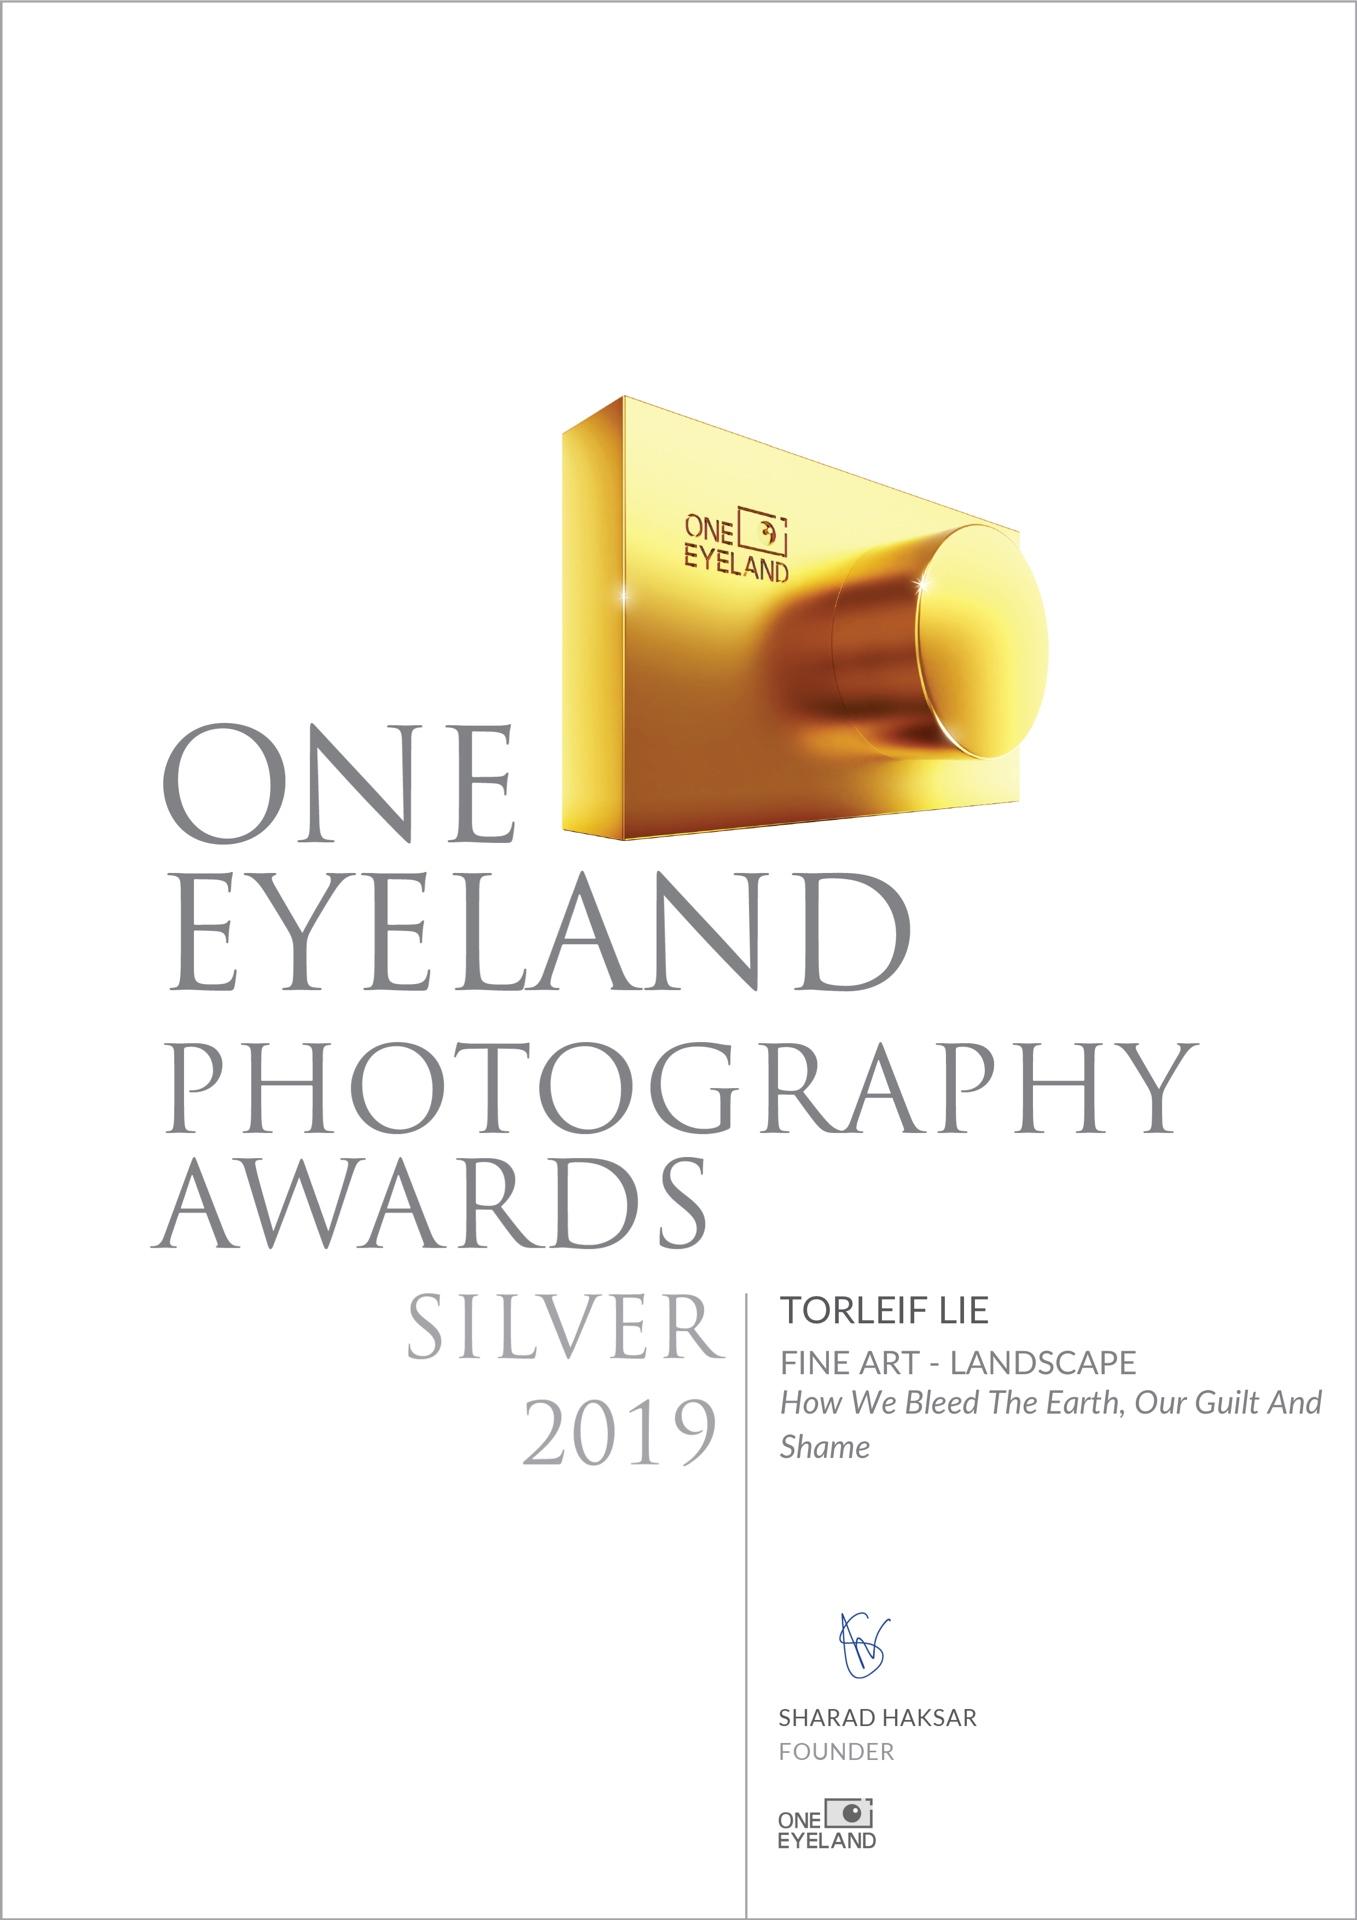 torleiflie-silver-fine-art-landscape